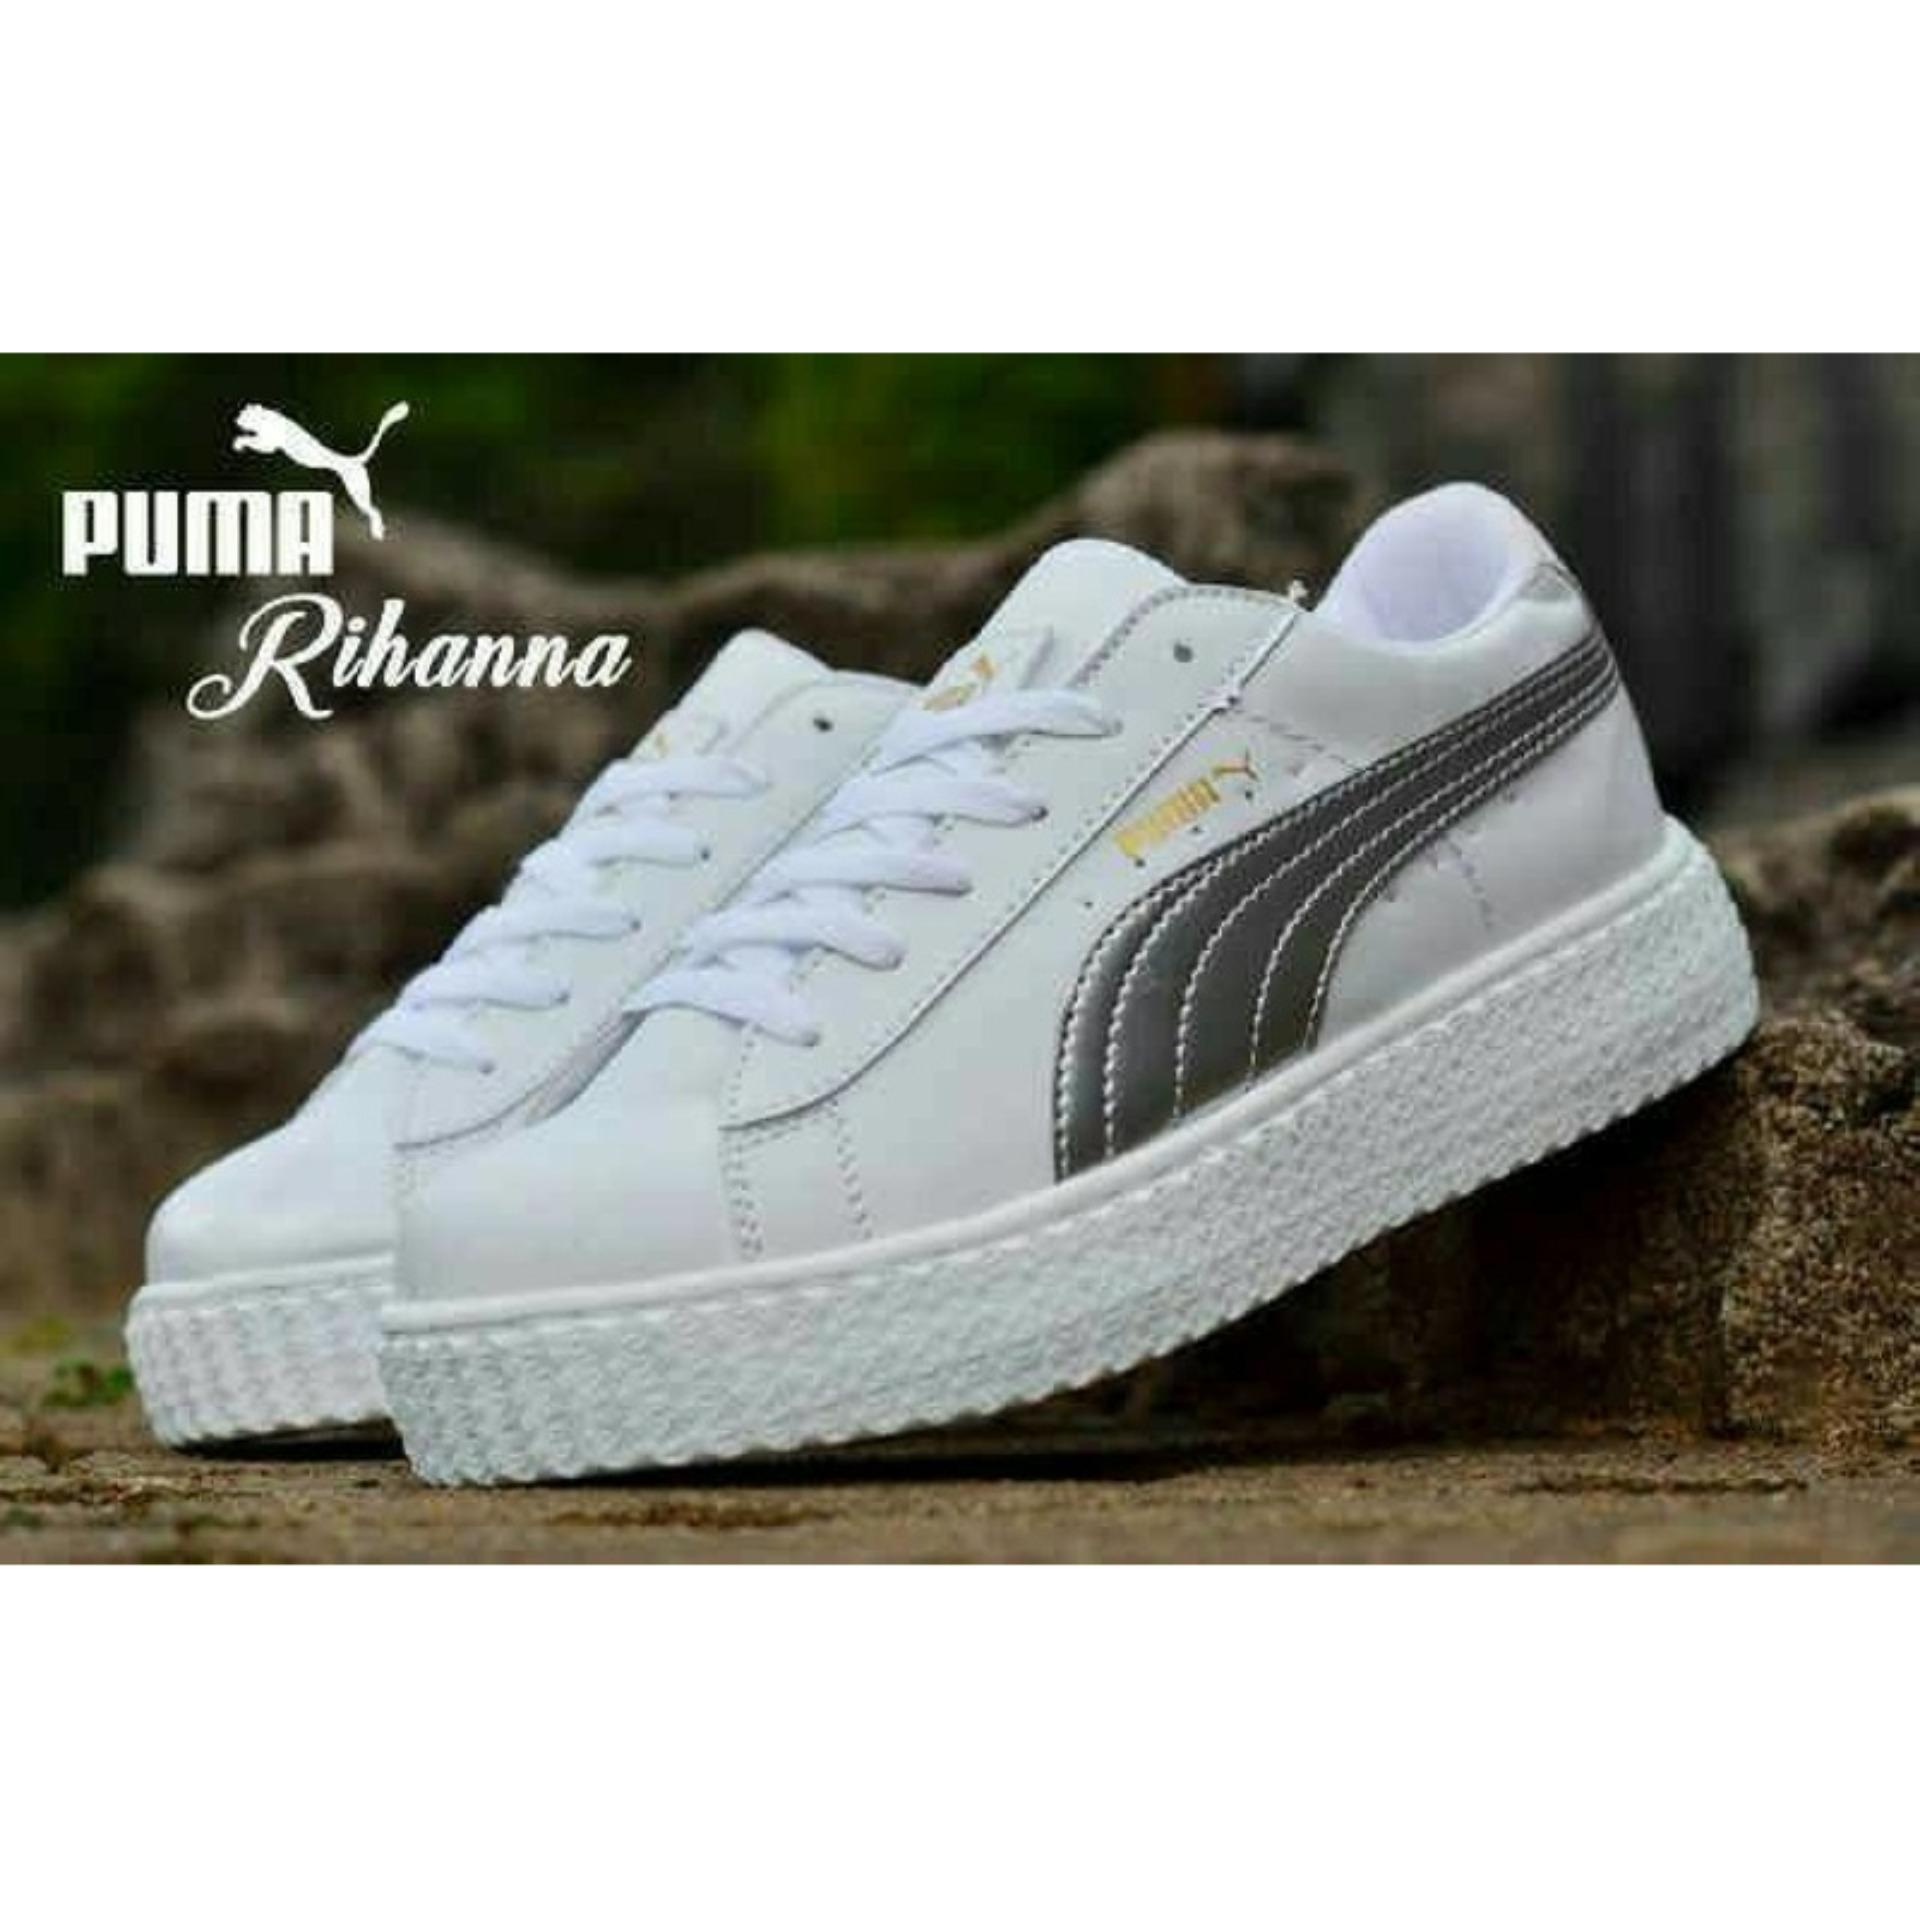 Grosir sepatu wanita murah - ecer - terbaru kets - casual - sport puma  silver 56ffc5990b